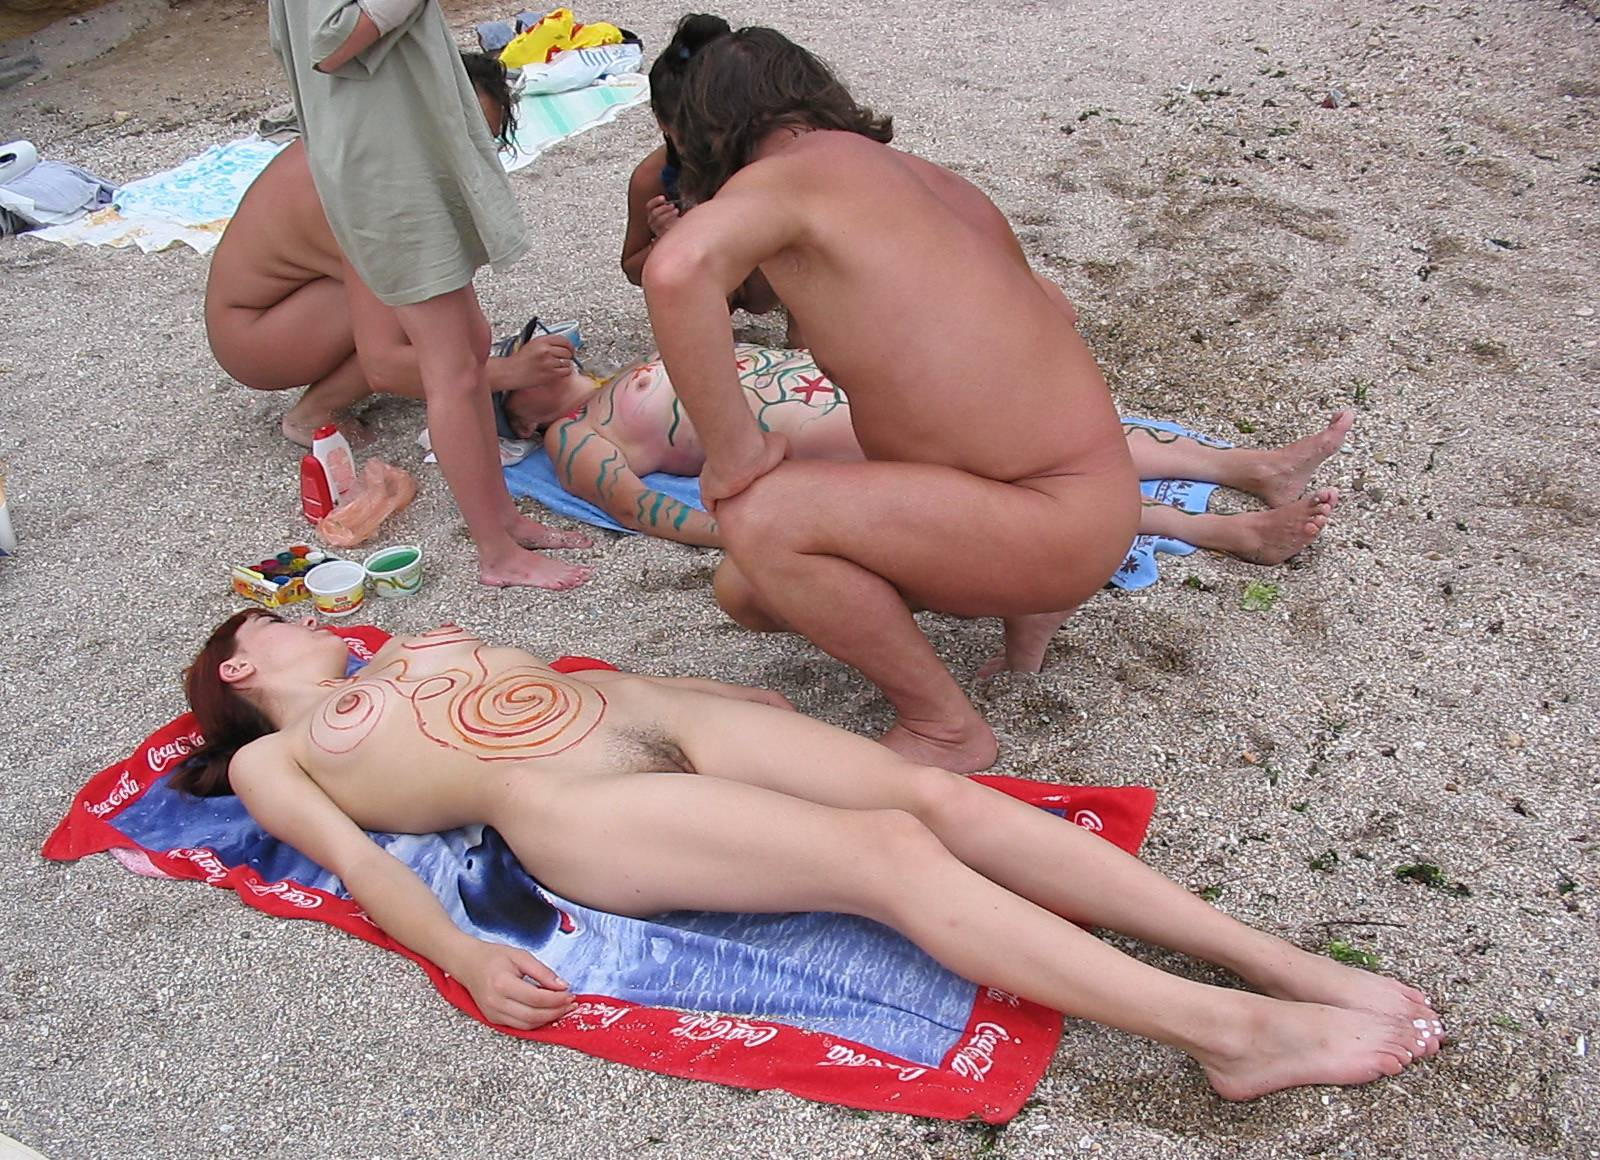 Black Sand Body Painting - 2